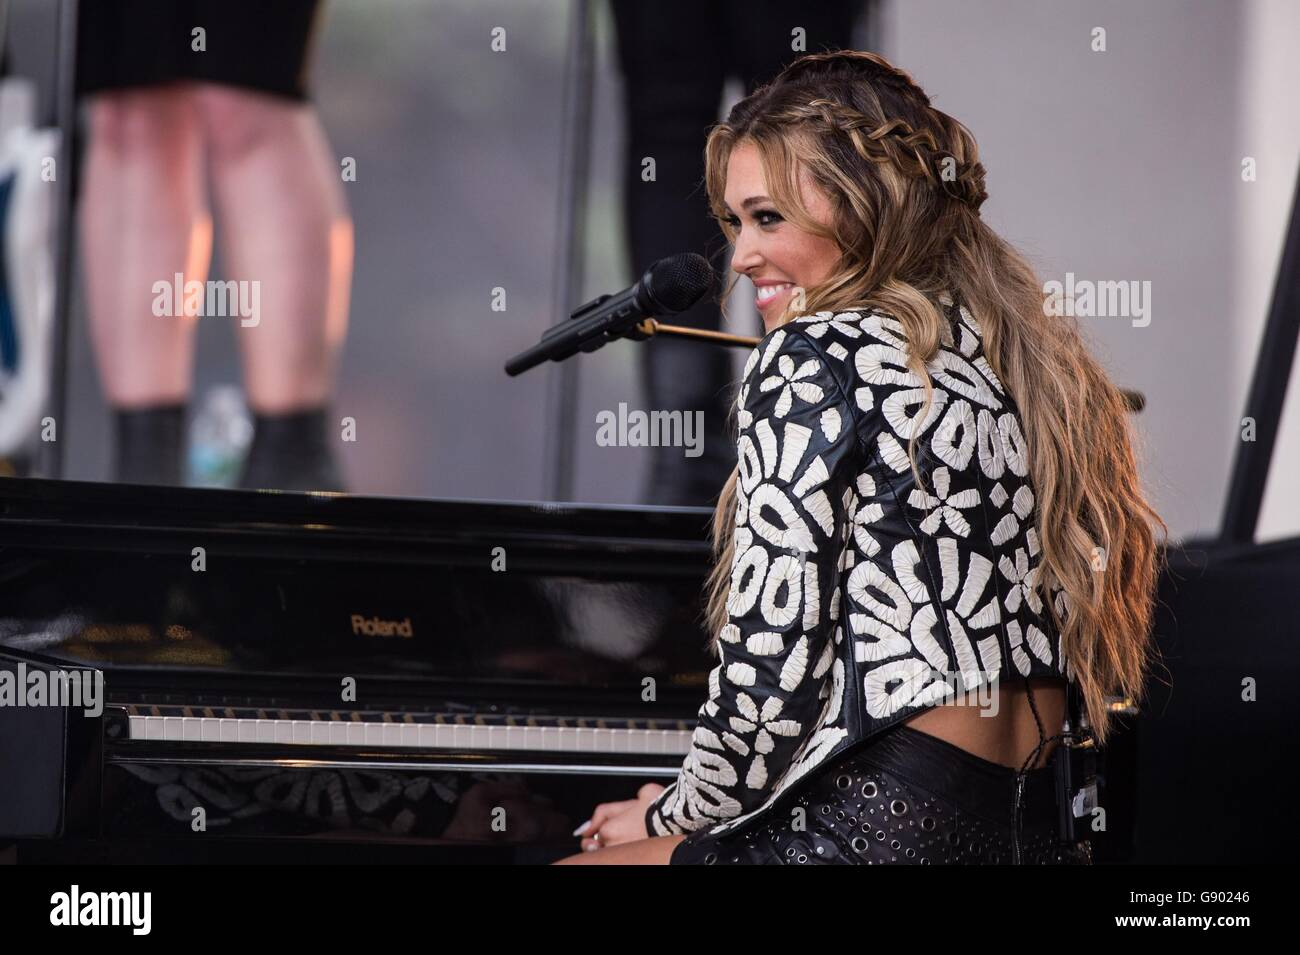 New York, NY, USA  1st July, 2016  Rachel Platten on stage